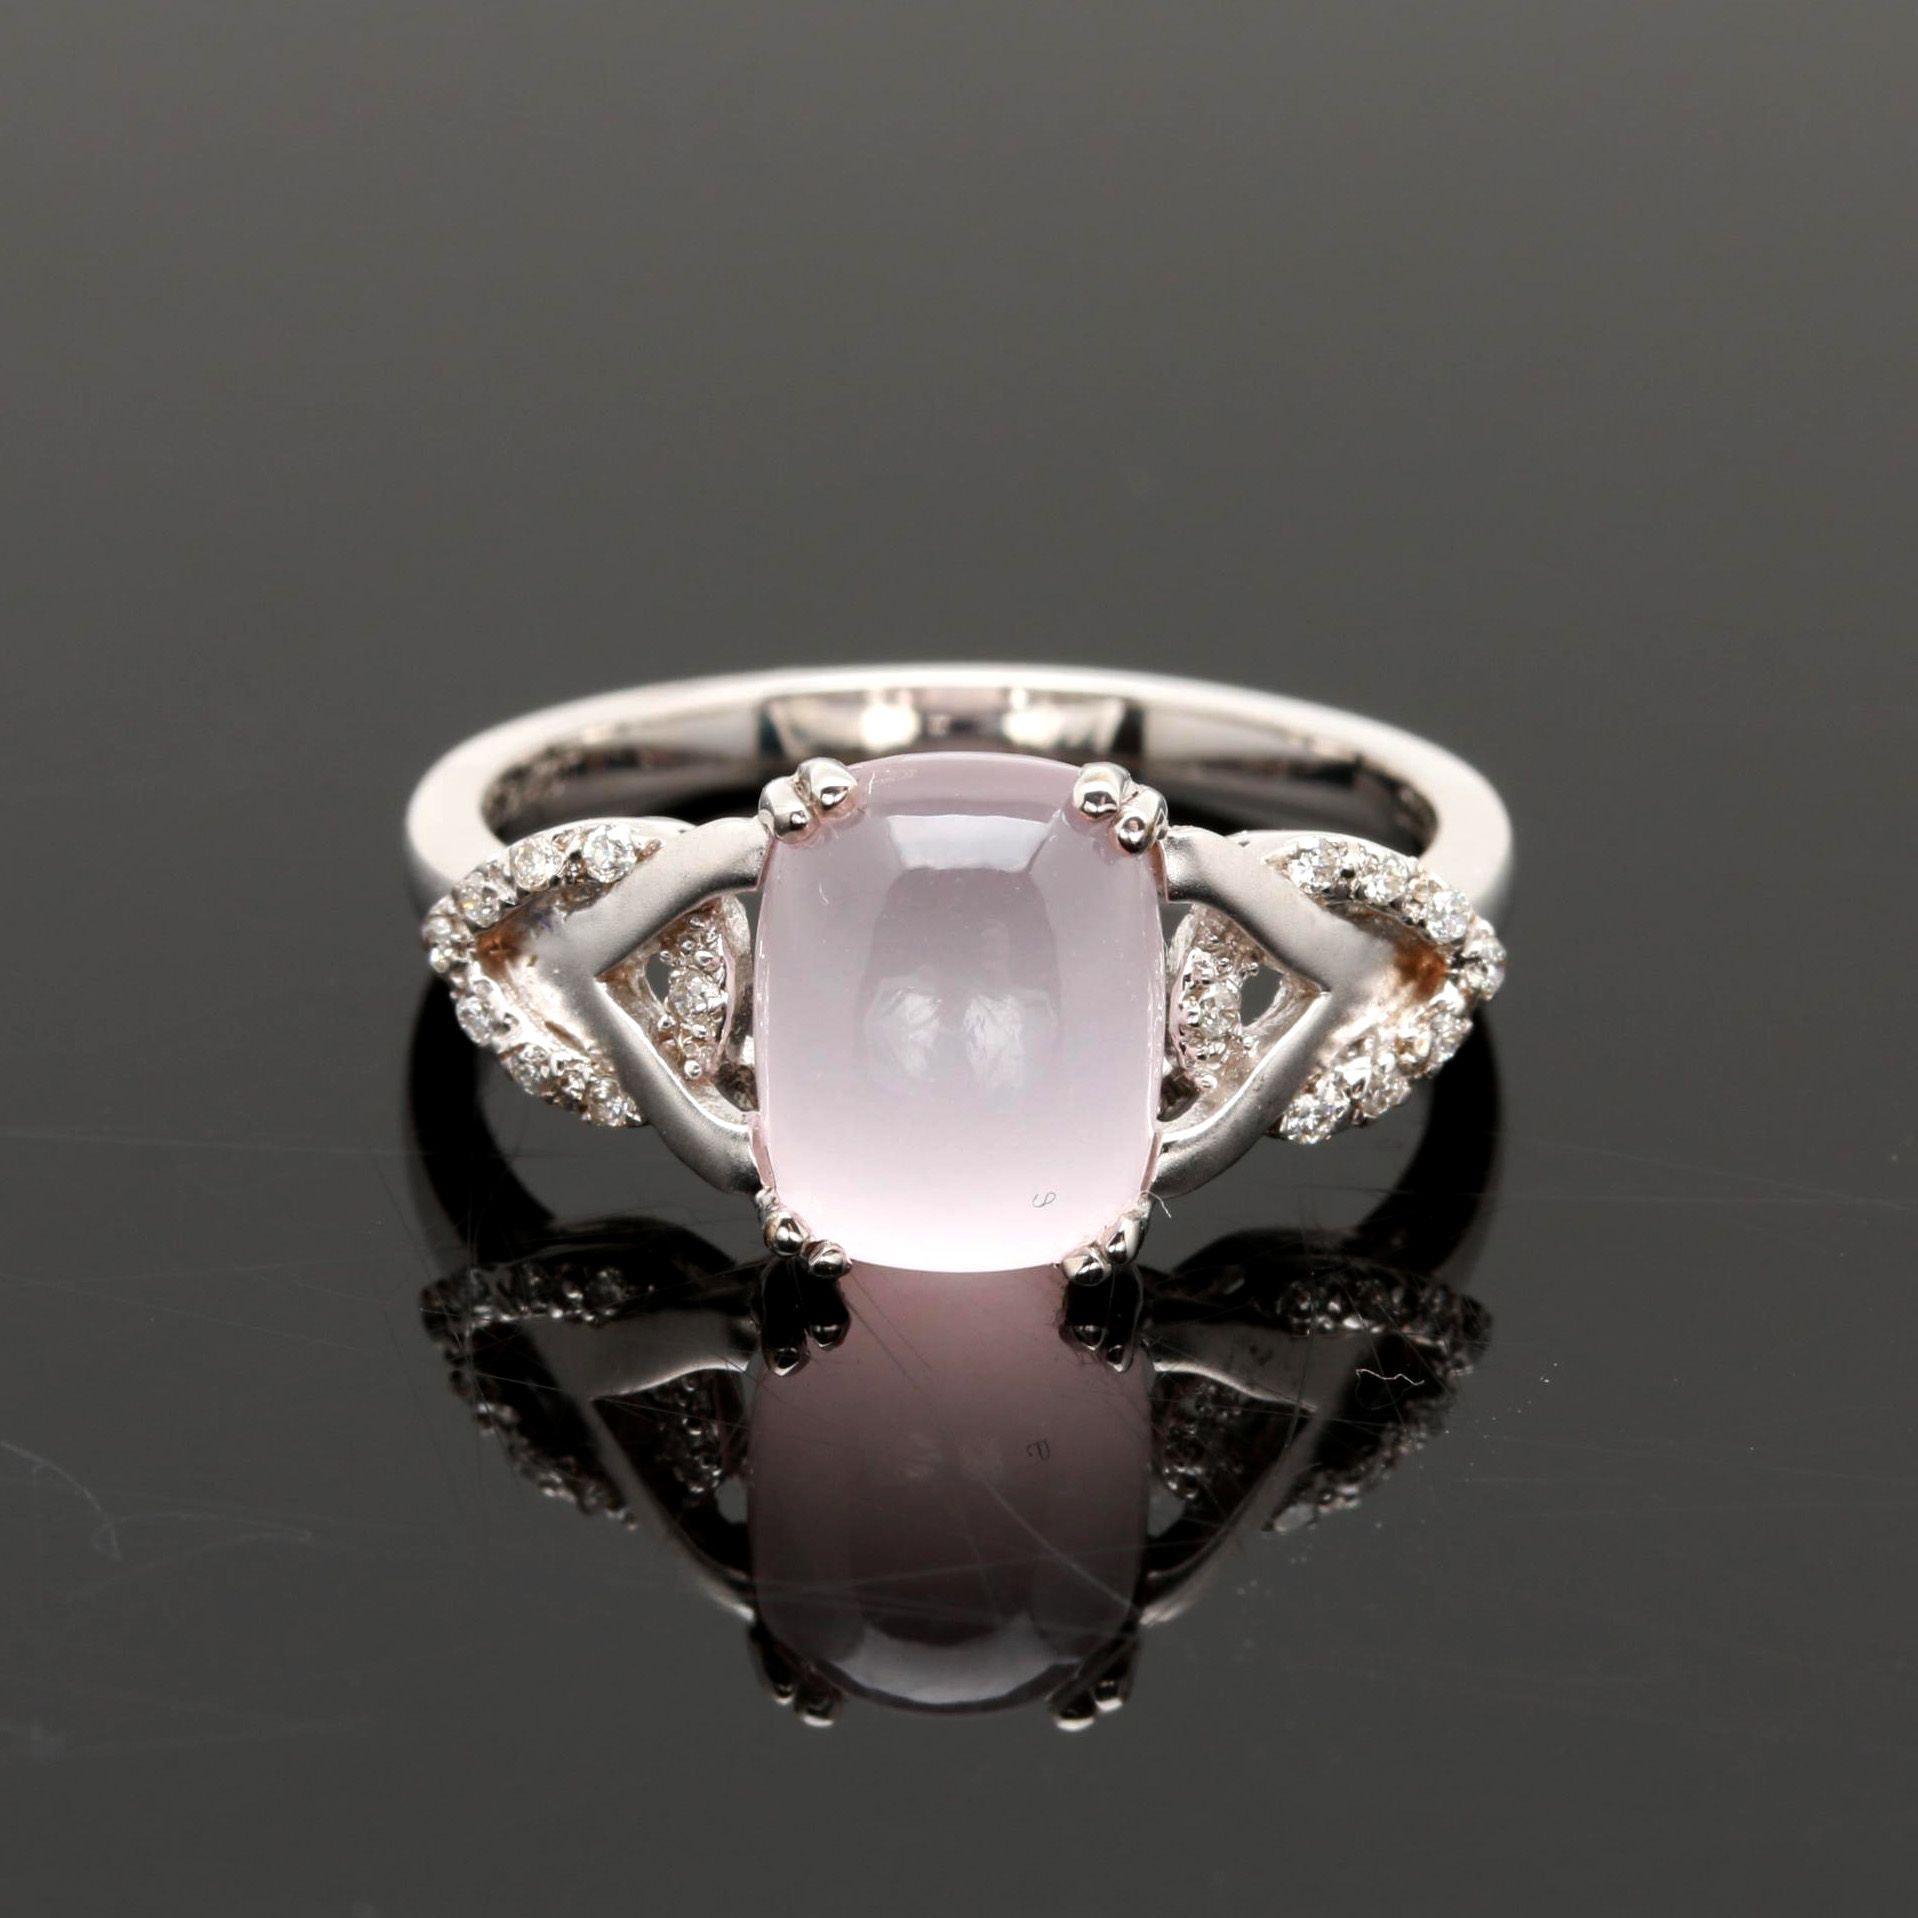 18K White Gold Rose Quartz and Diamond Ring